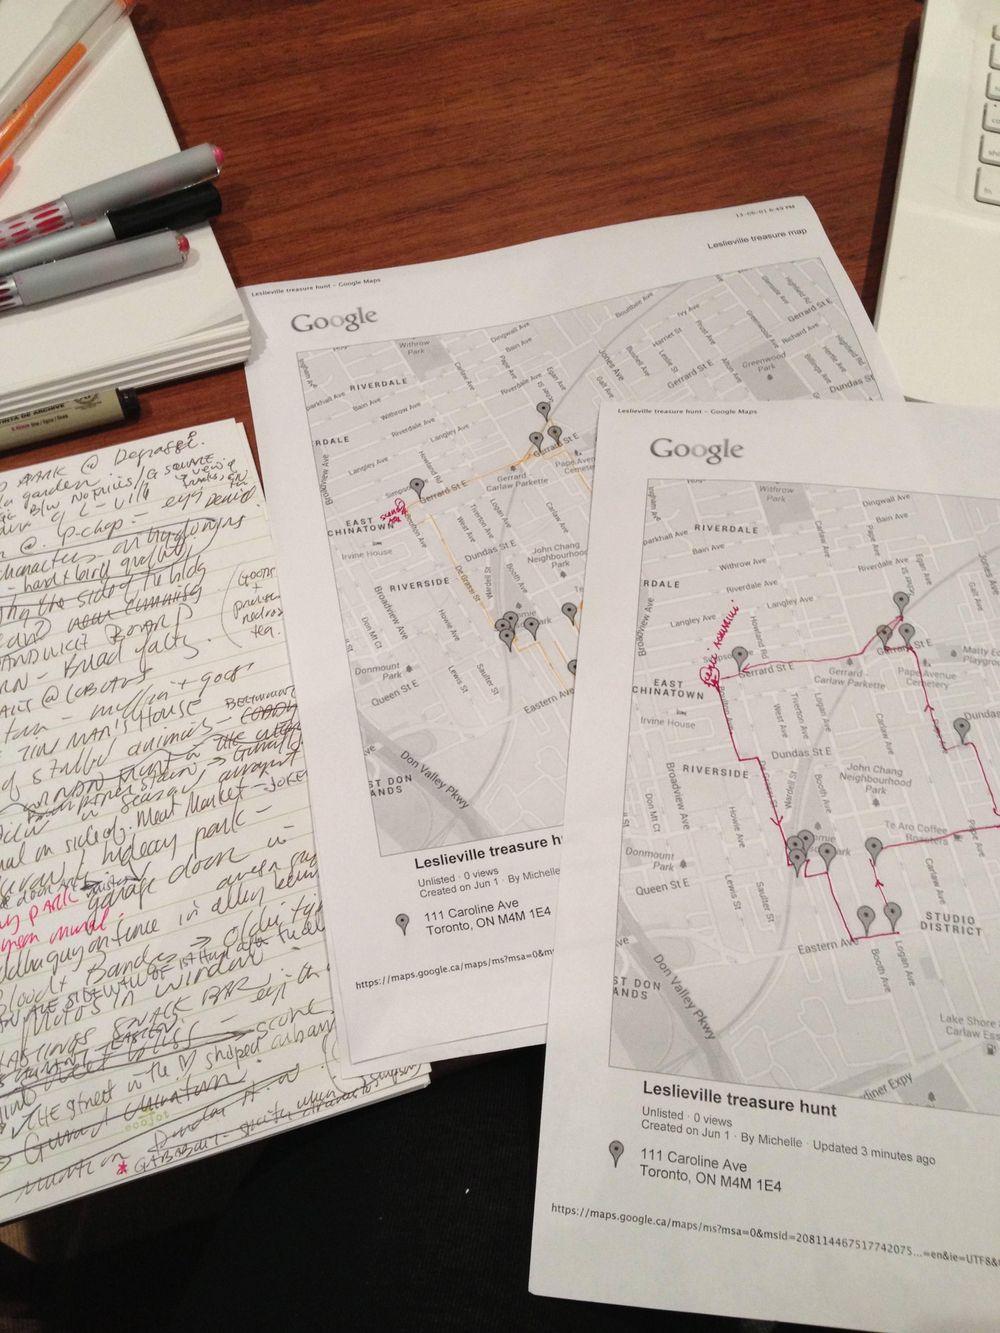 Leslieville Curiosities - a treasure map of hidden neighbourhood gems    - image 2 - student project